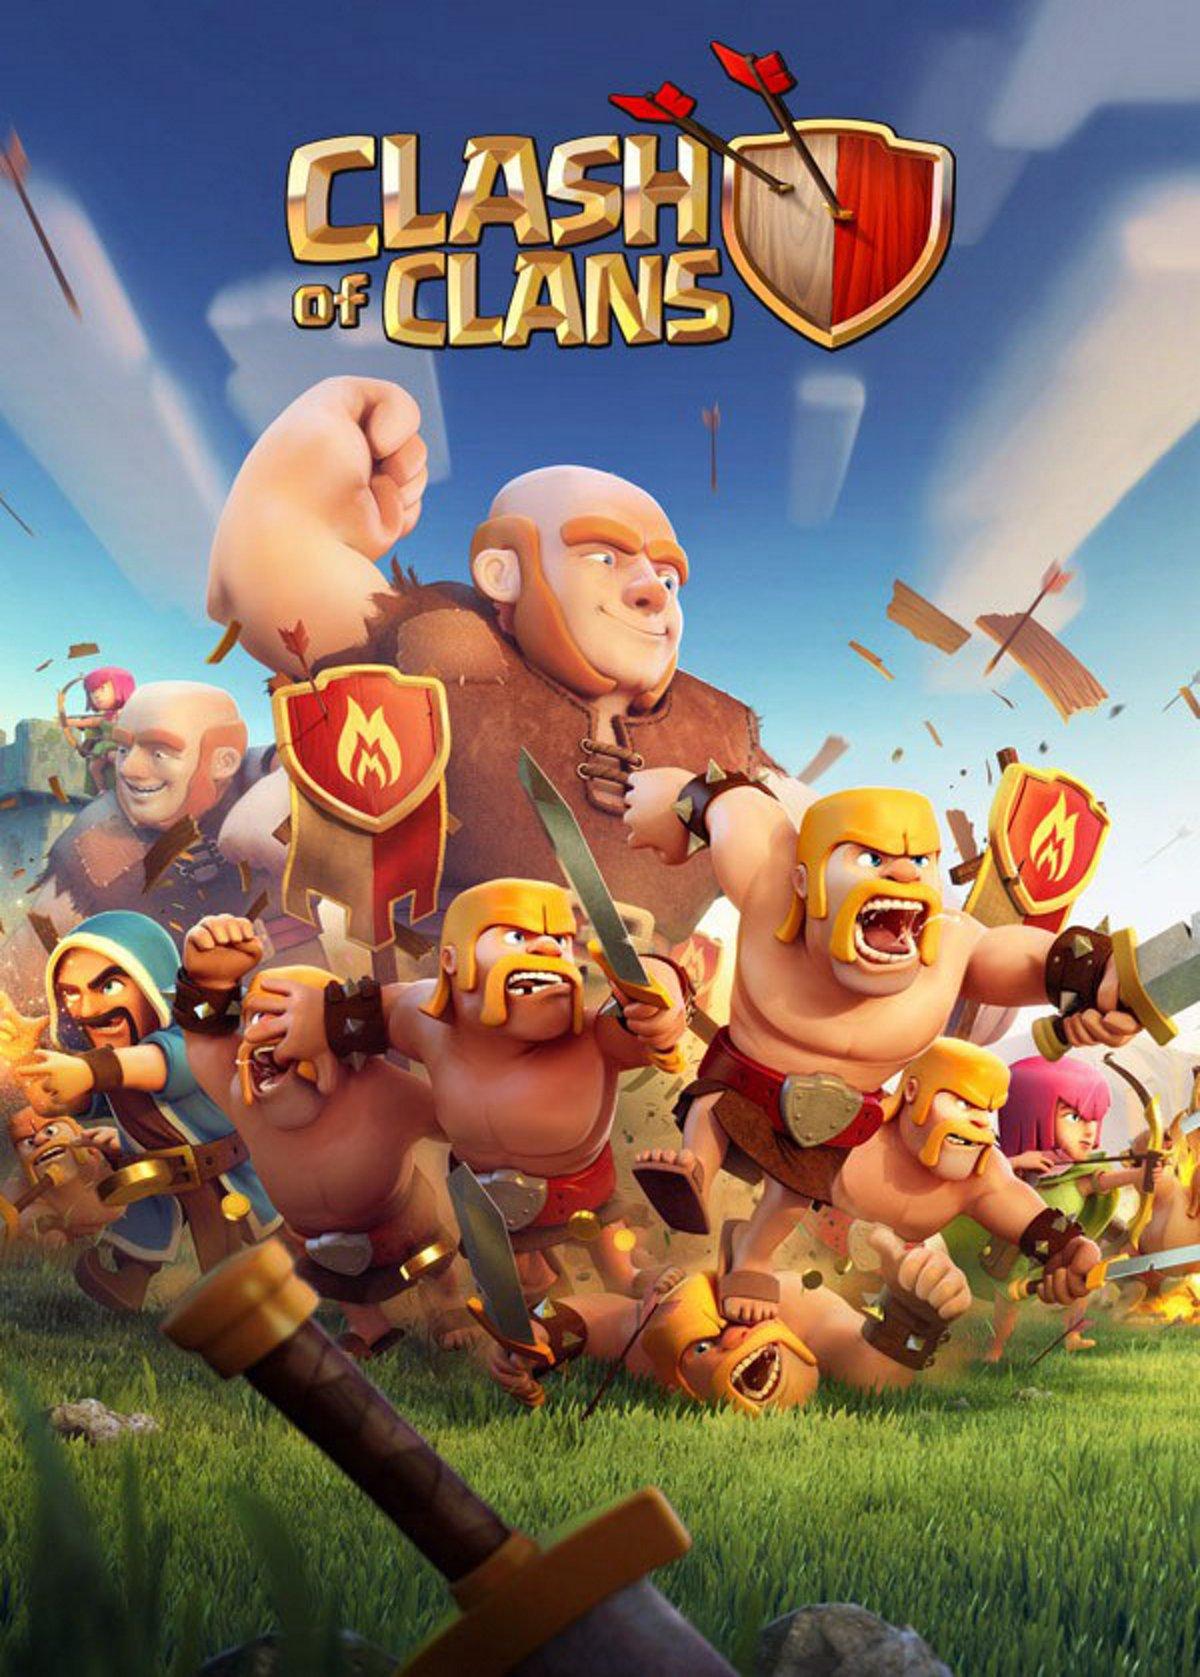 Clash Of Clans Wallpapers - WeNeedFun